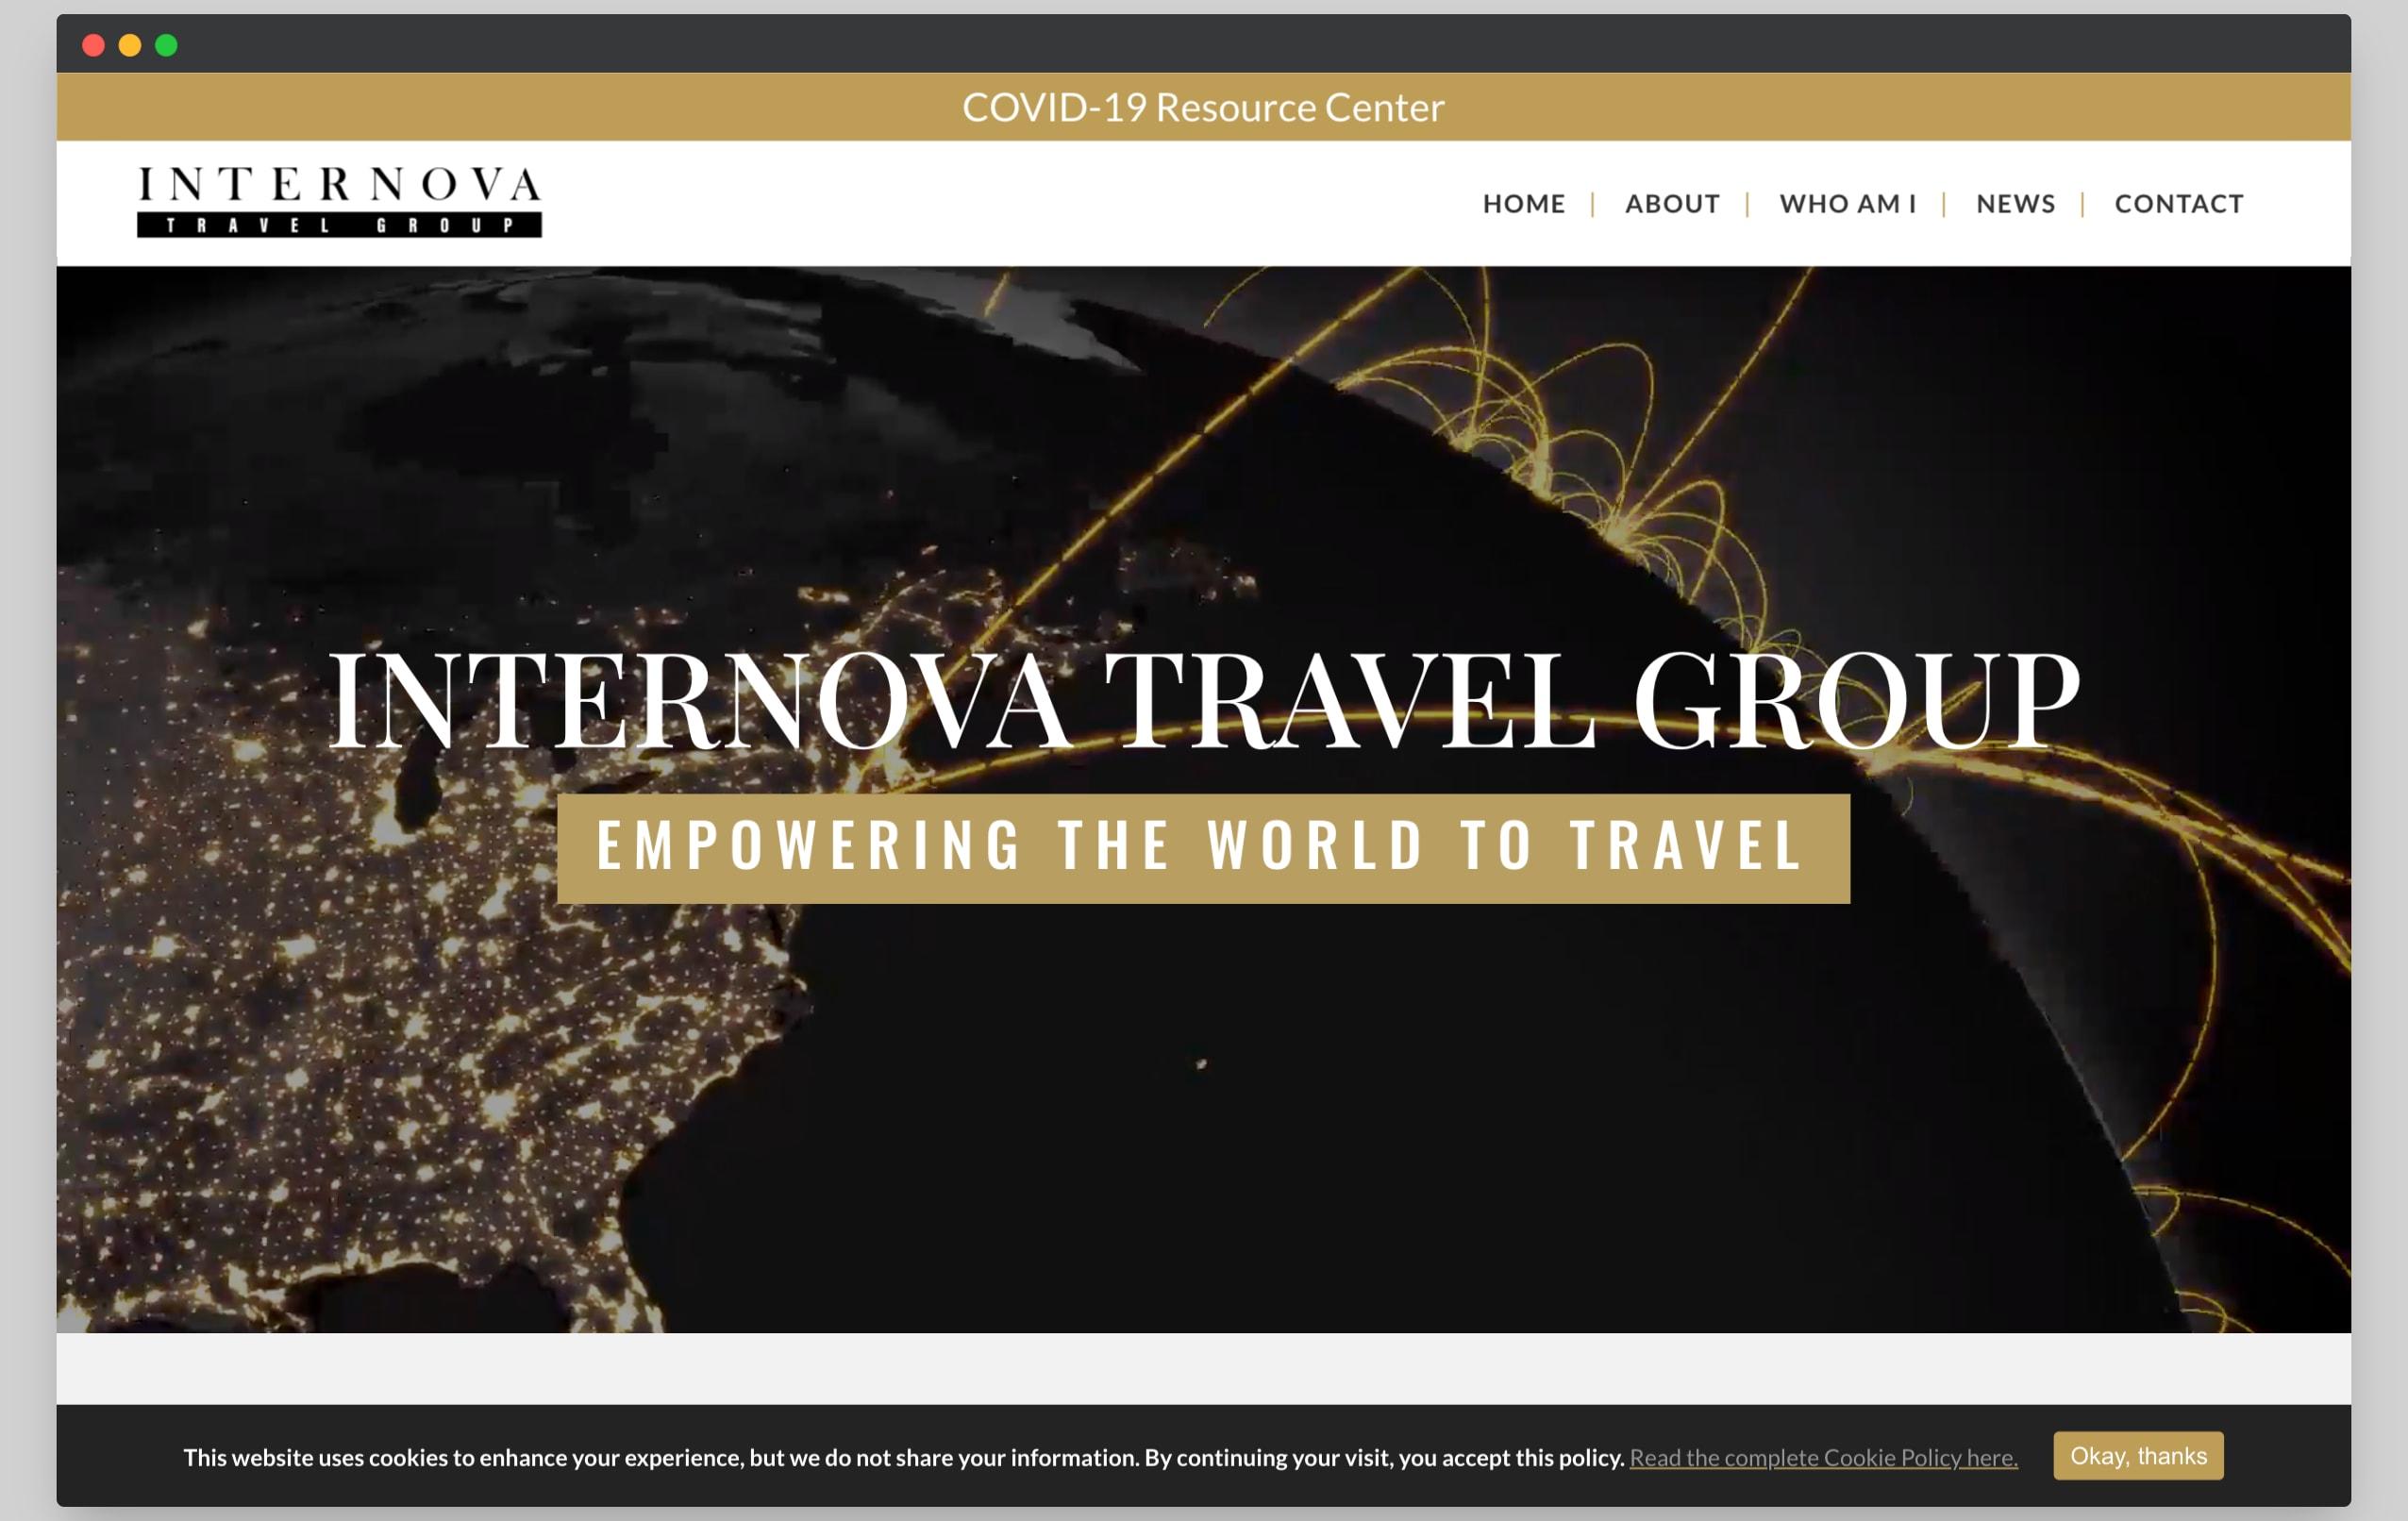 Travel Leaders Group / Internova Travel Group